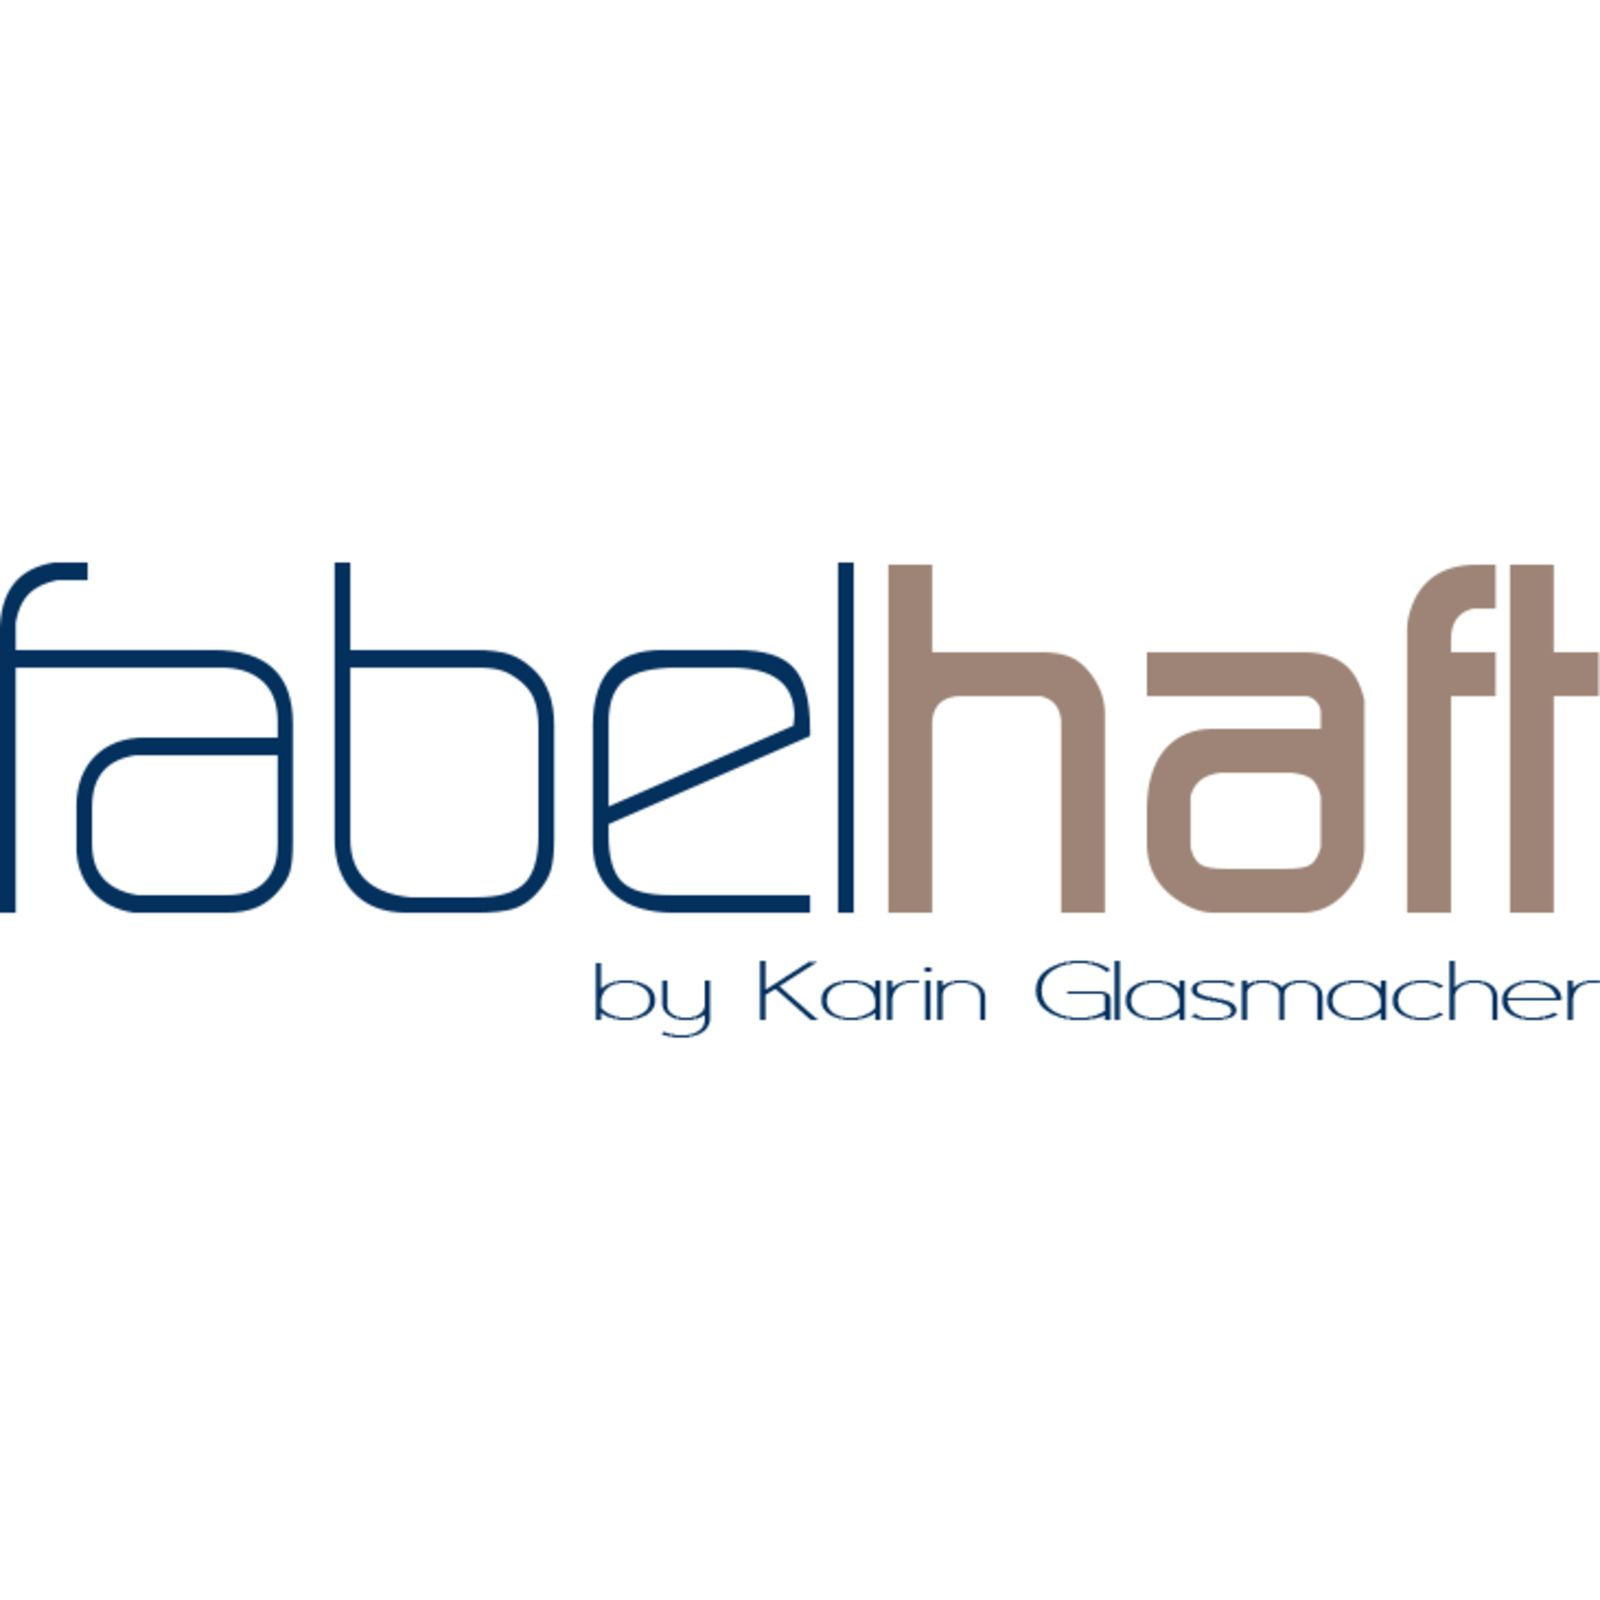 fabelhaft by KARIN GLASMACHER